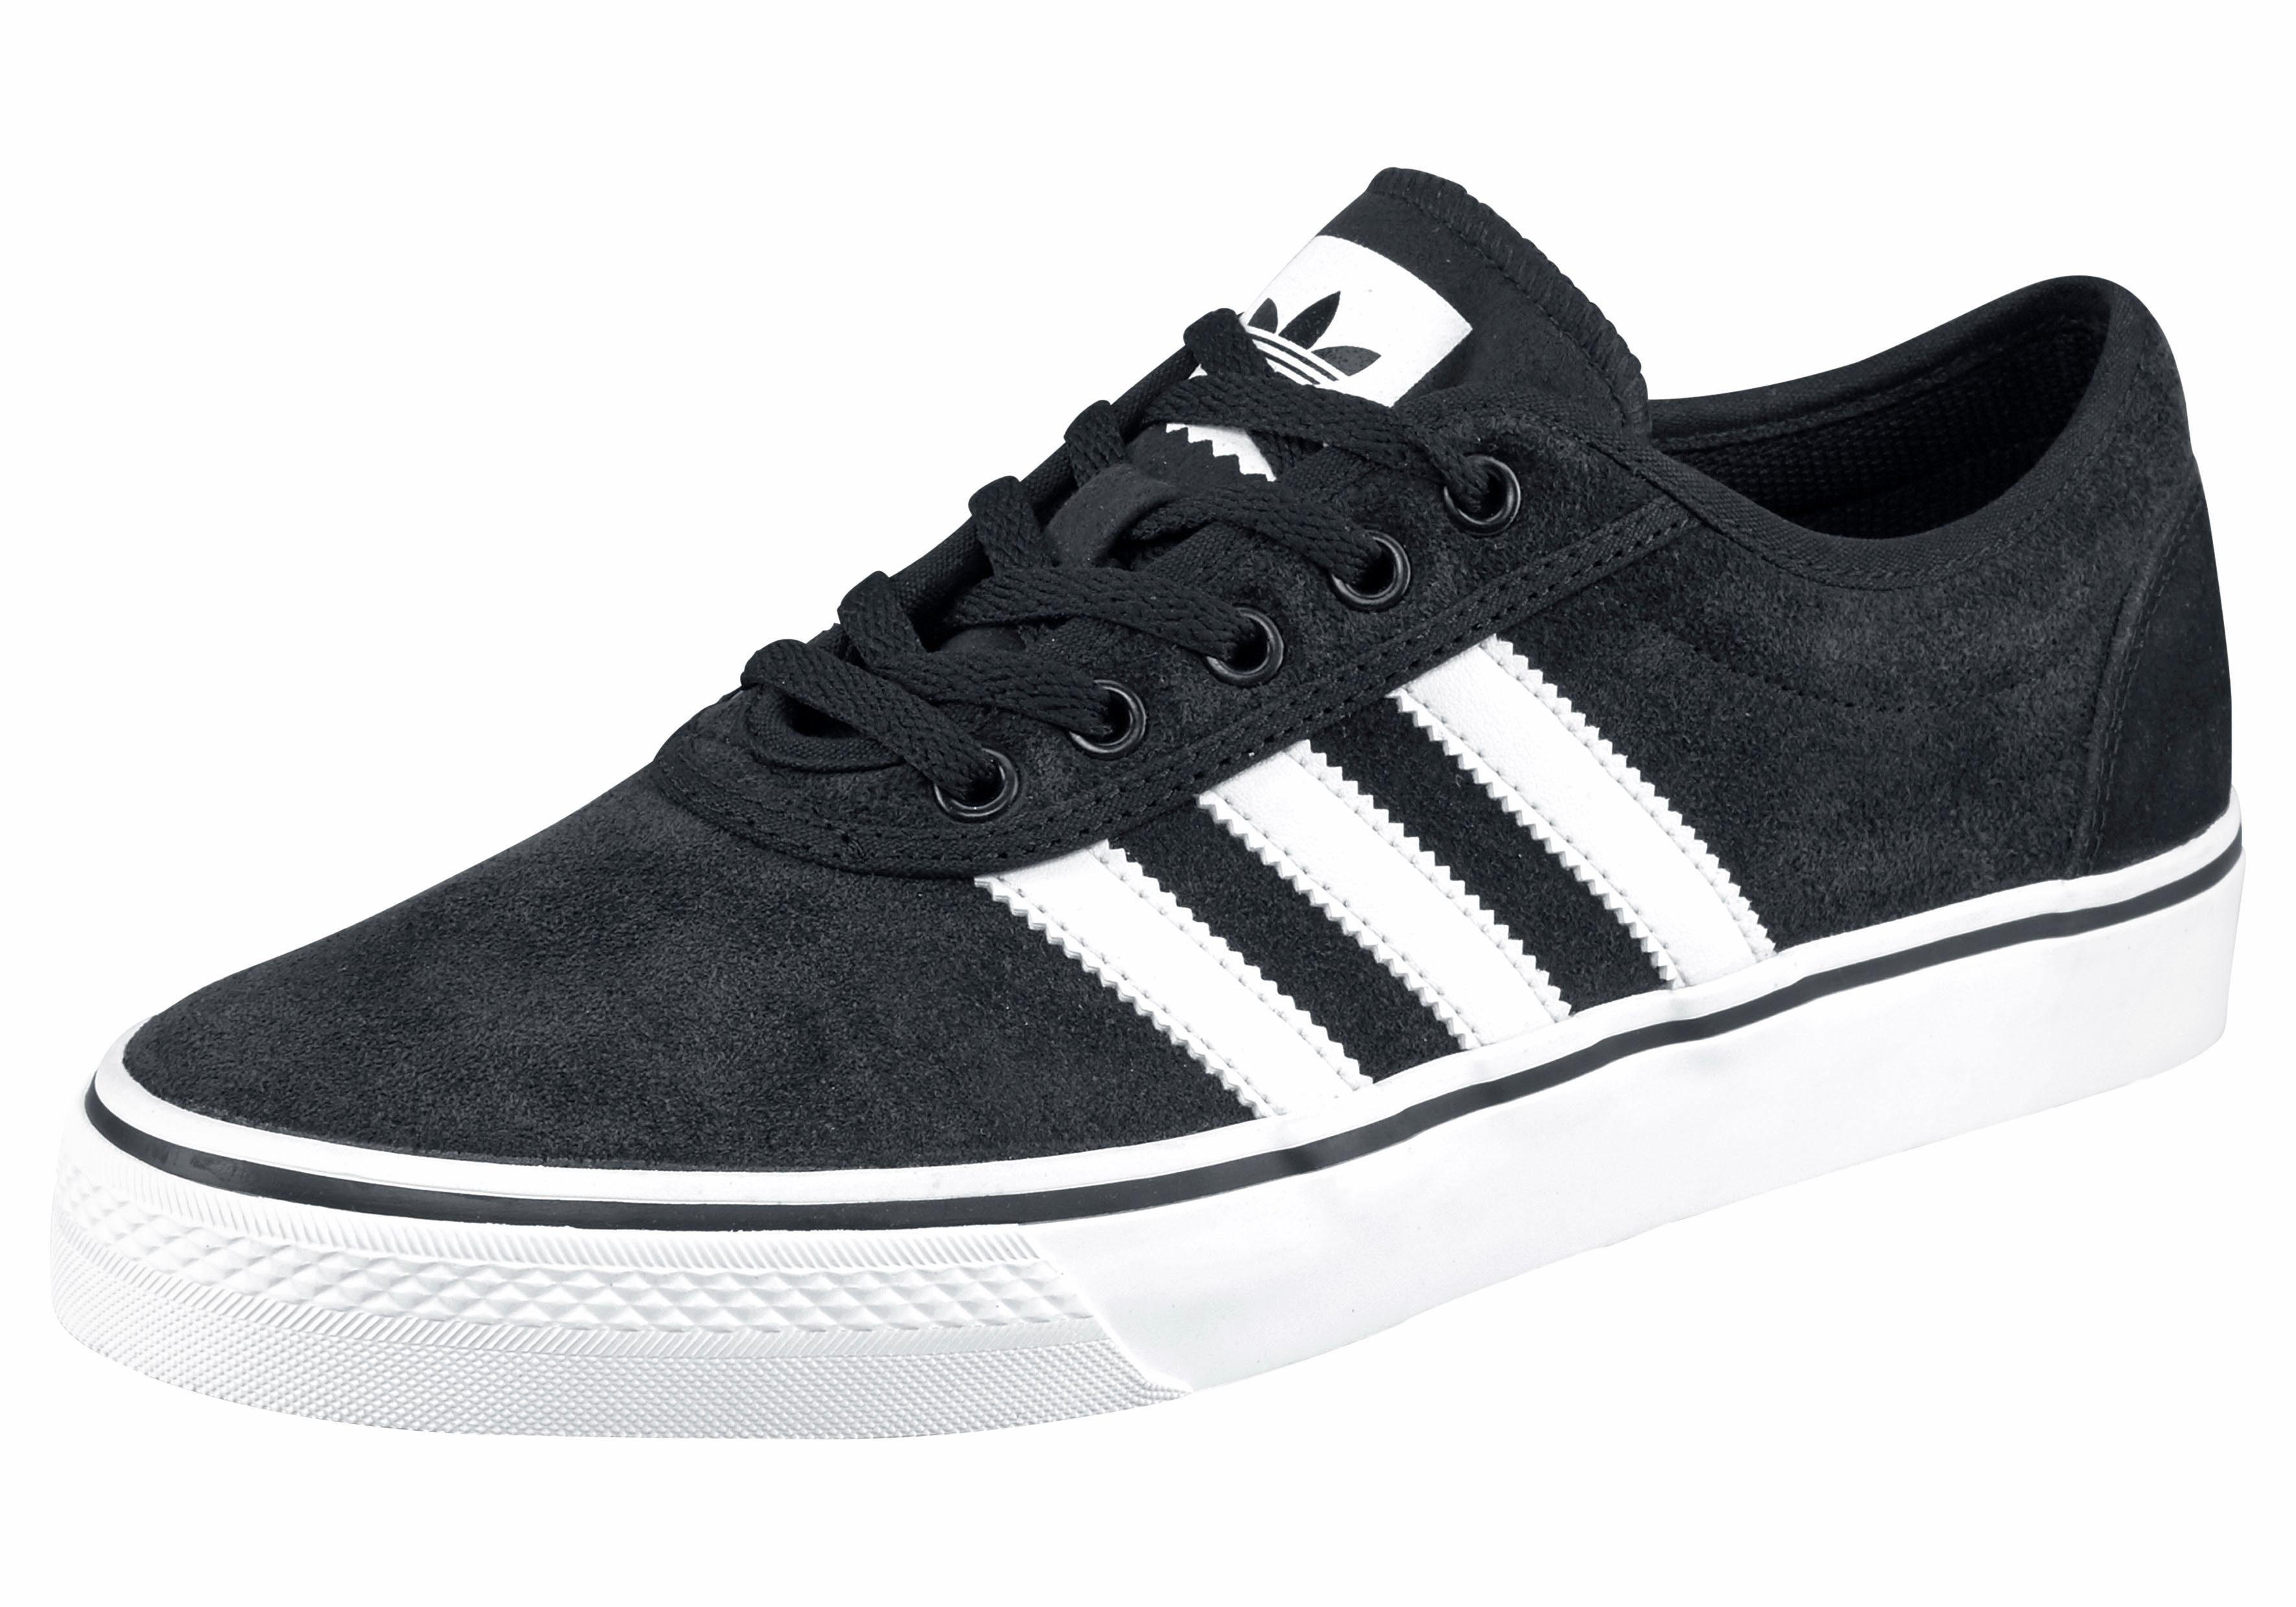 Sneaker Online »adi Ease« Originals Adidas KaufenOtto XkPiZu